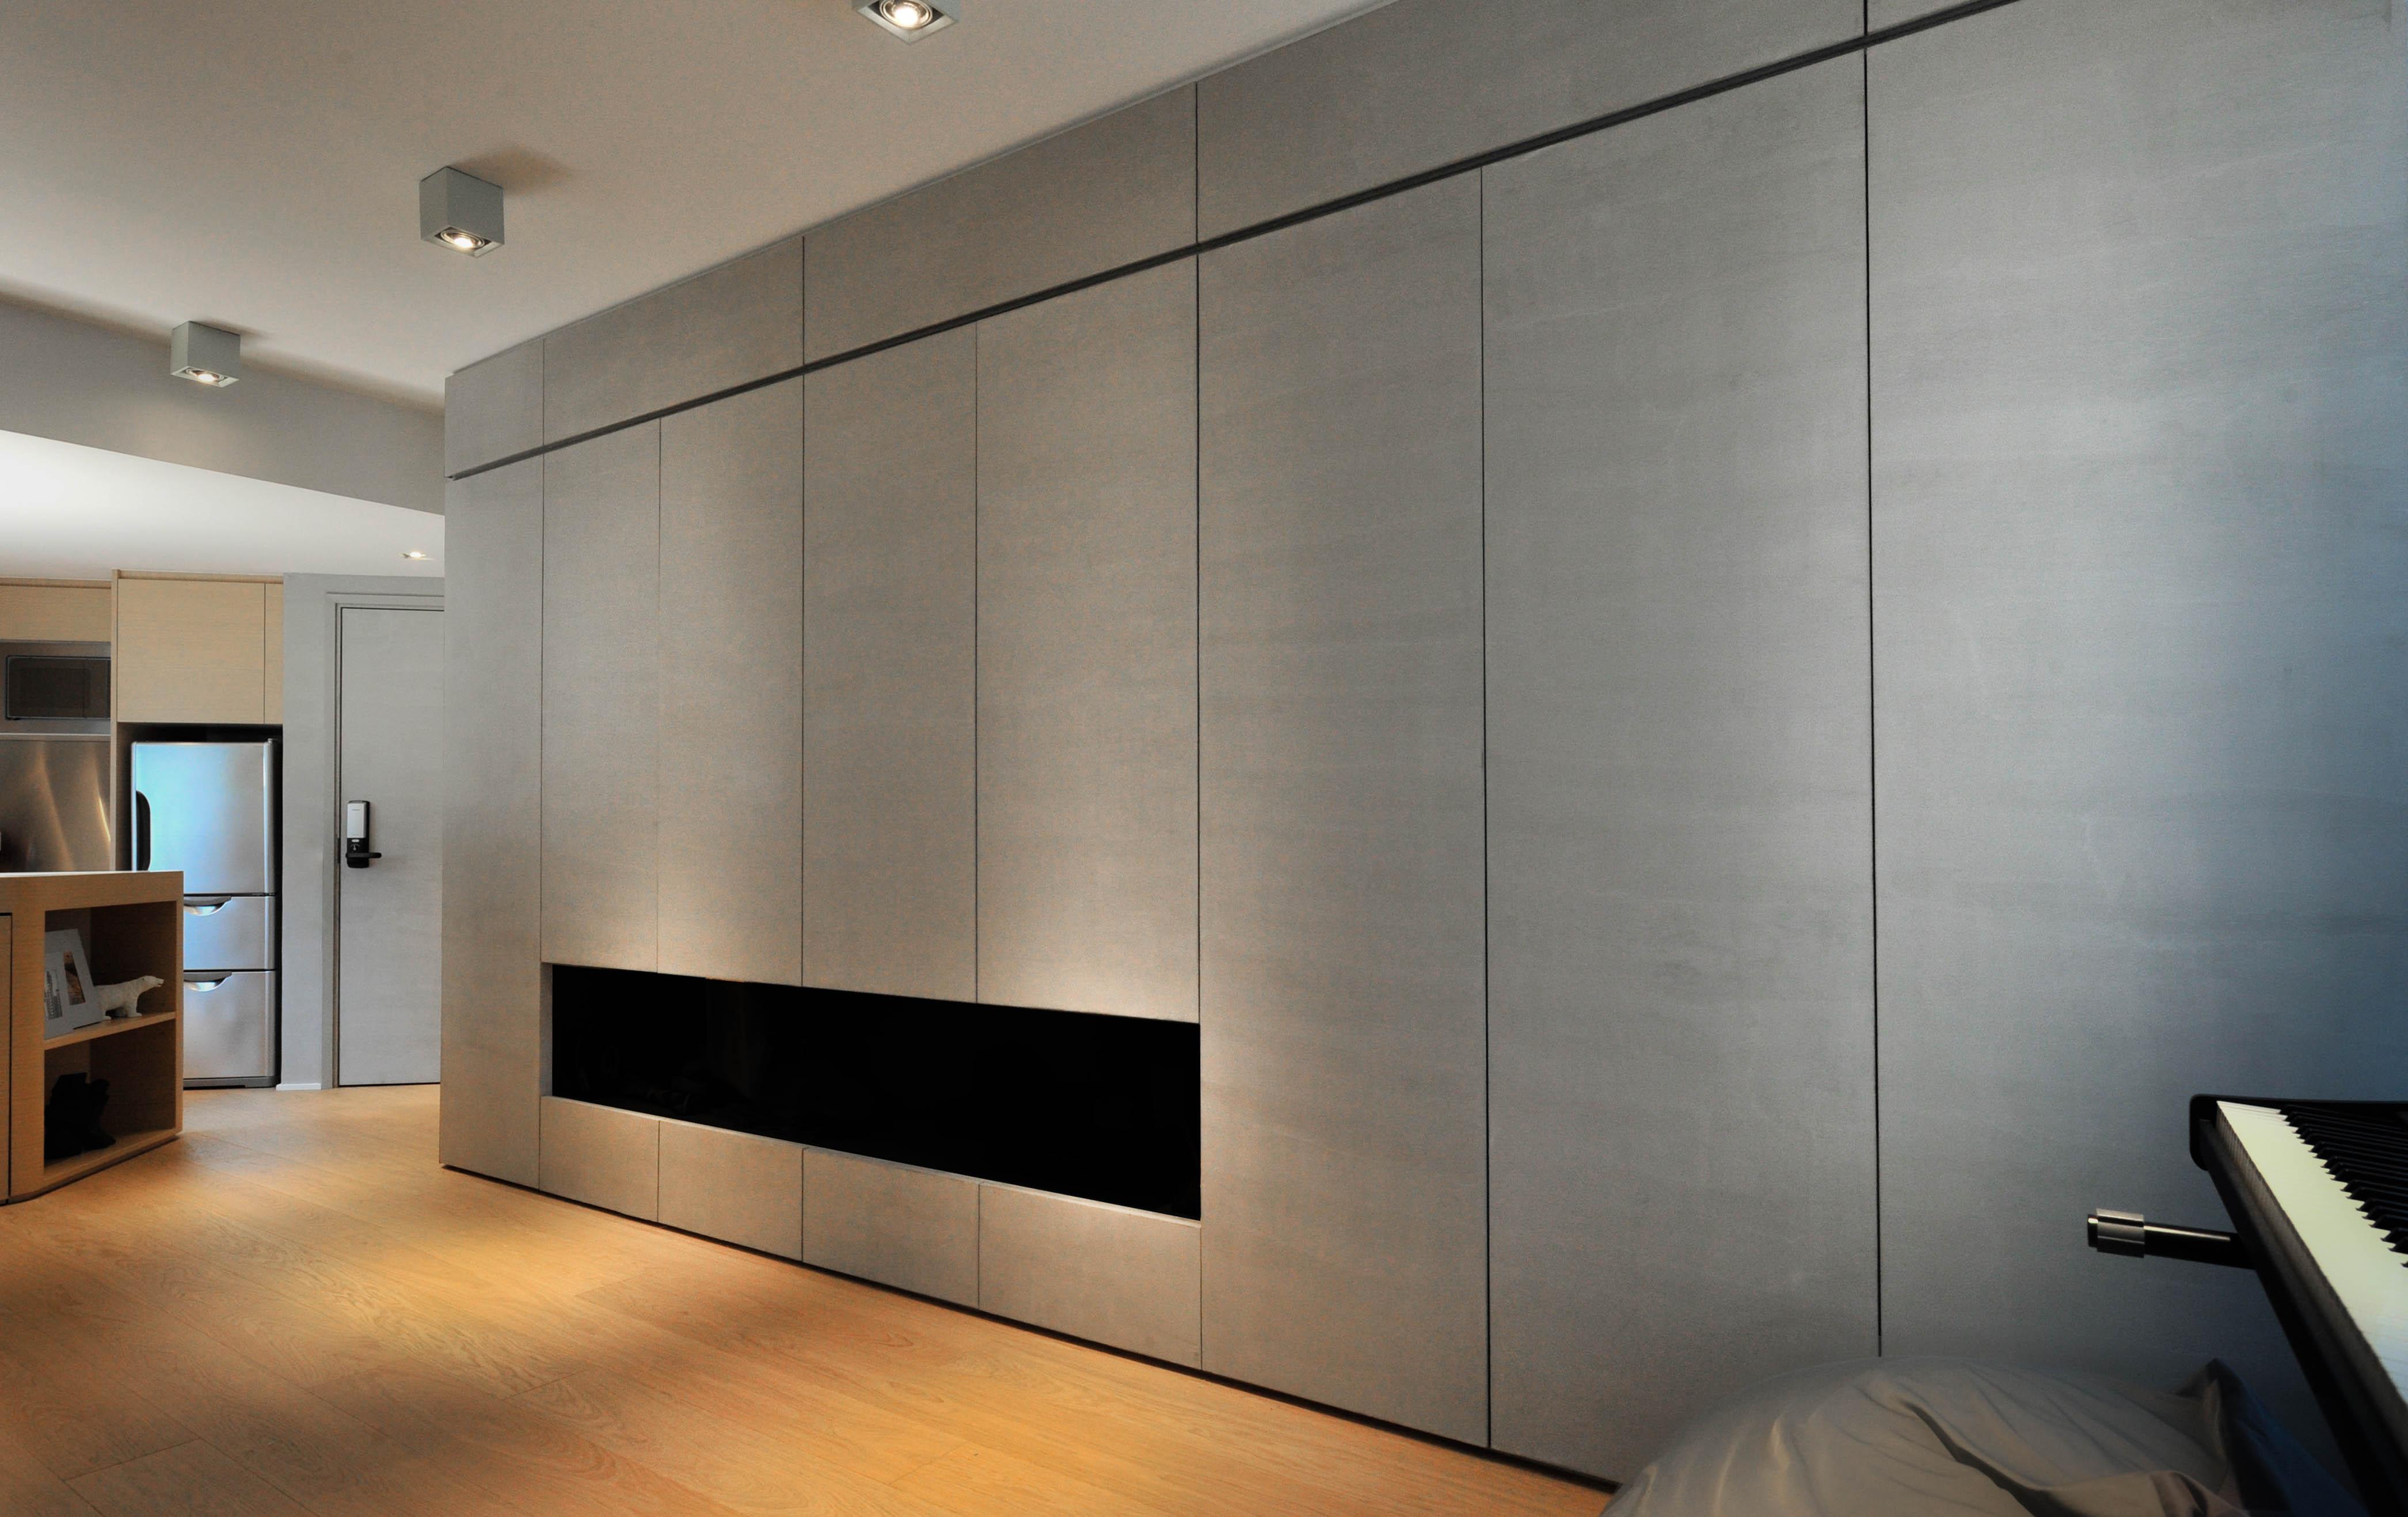 家居設計 Home Design hk  _綠_升級的家 Green within 600sqft (7)